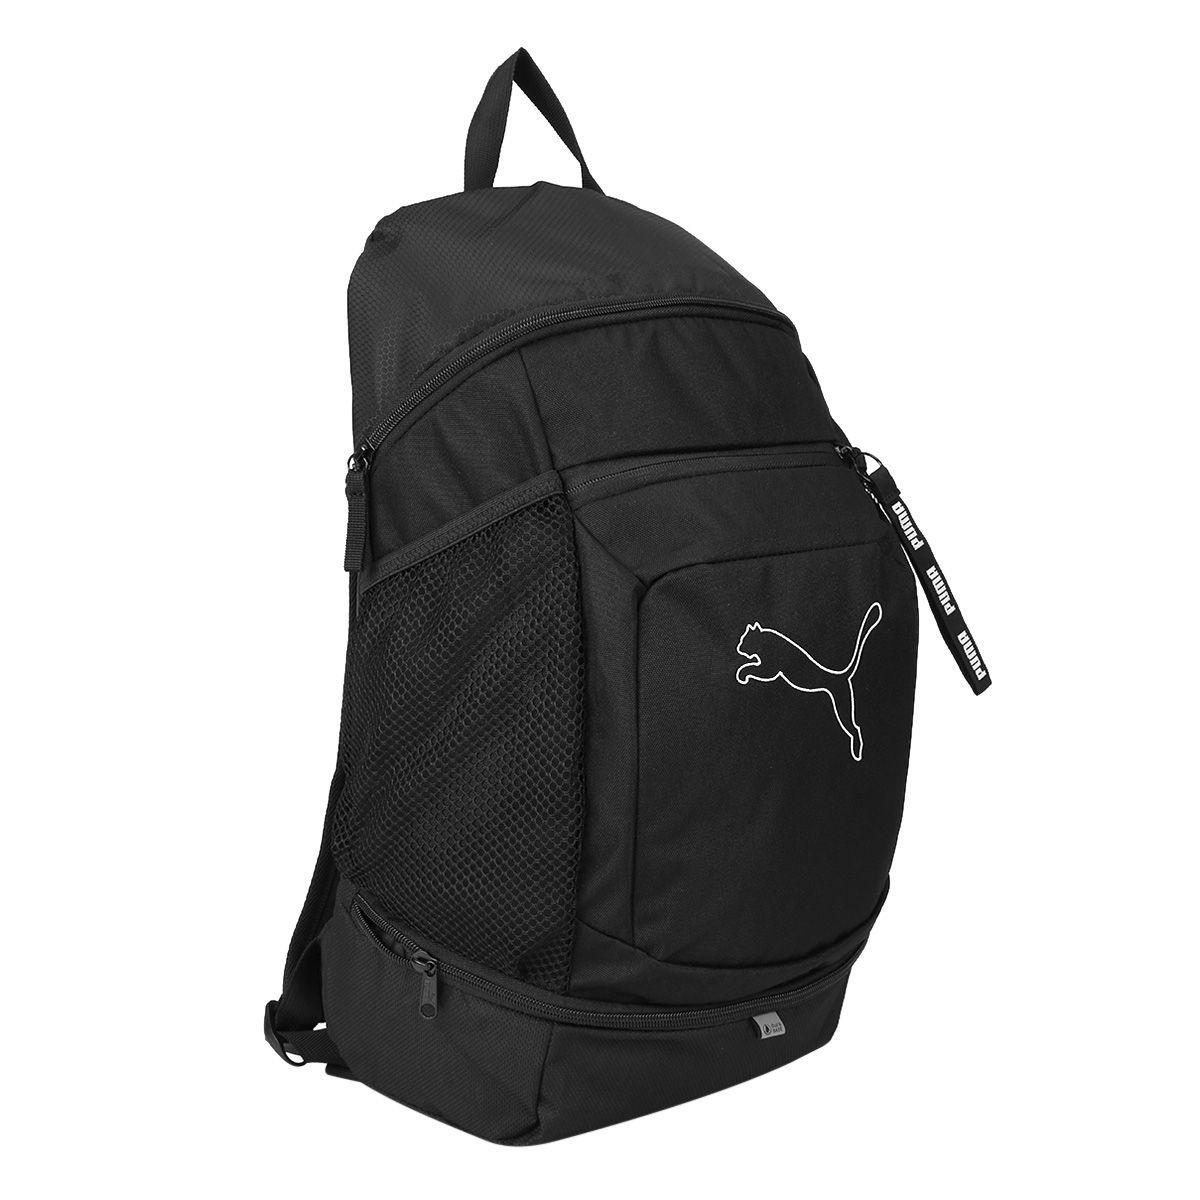 mochila puma echo backpack-75107 - preto. Carregando zoom. 0a76aecd455b5